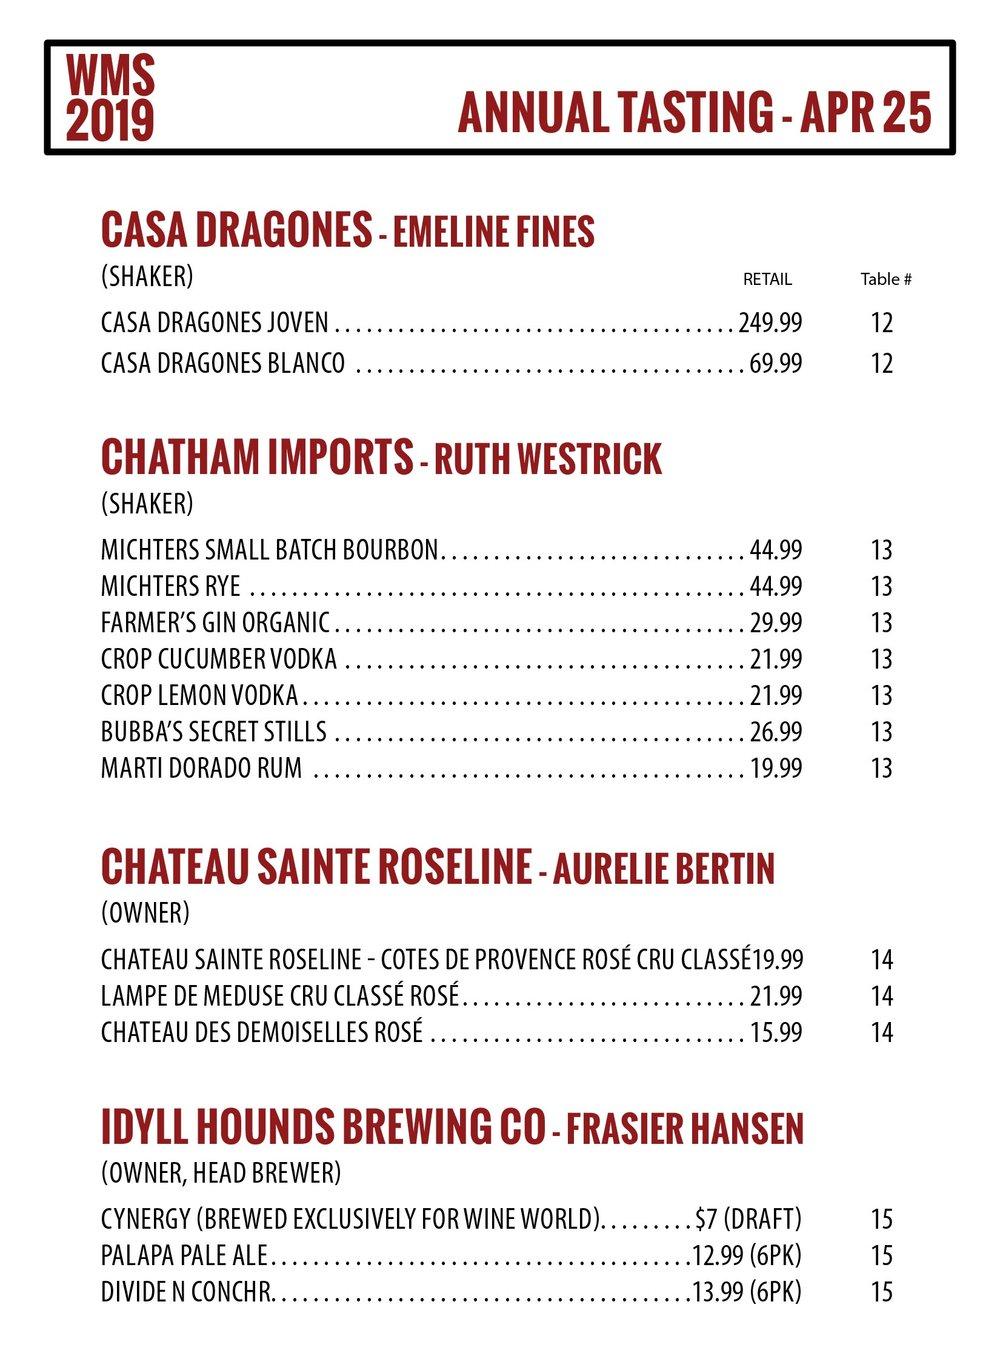 Winemakers+and+Shakers_Tasting+Guide_20196.jpg